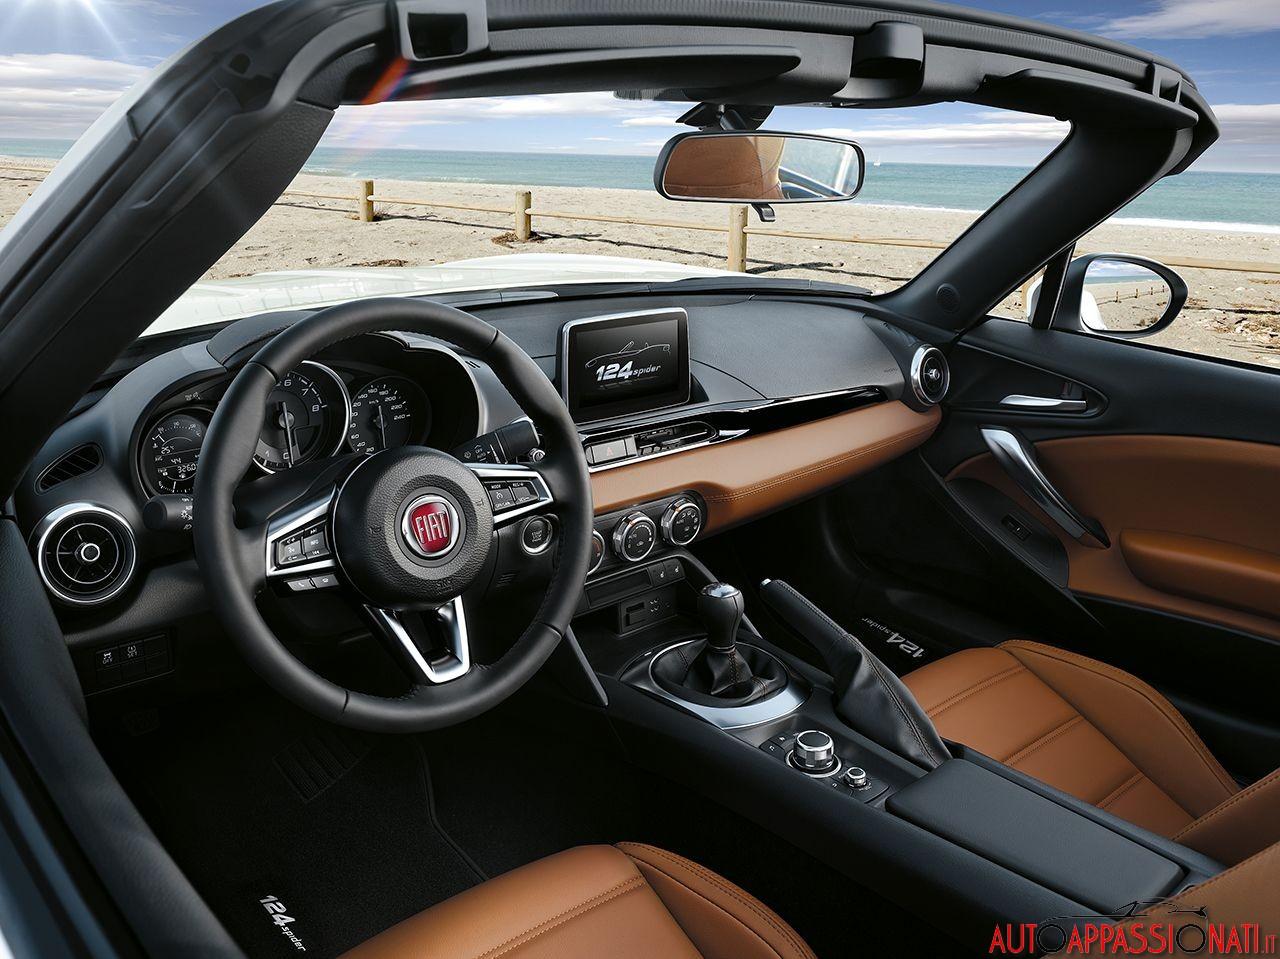 Fiat 124 Spider interni